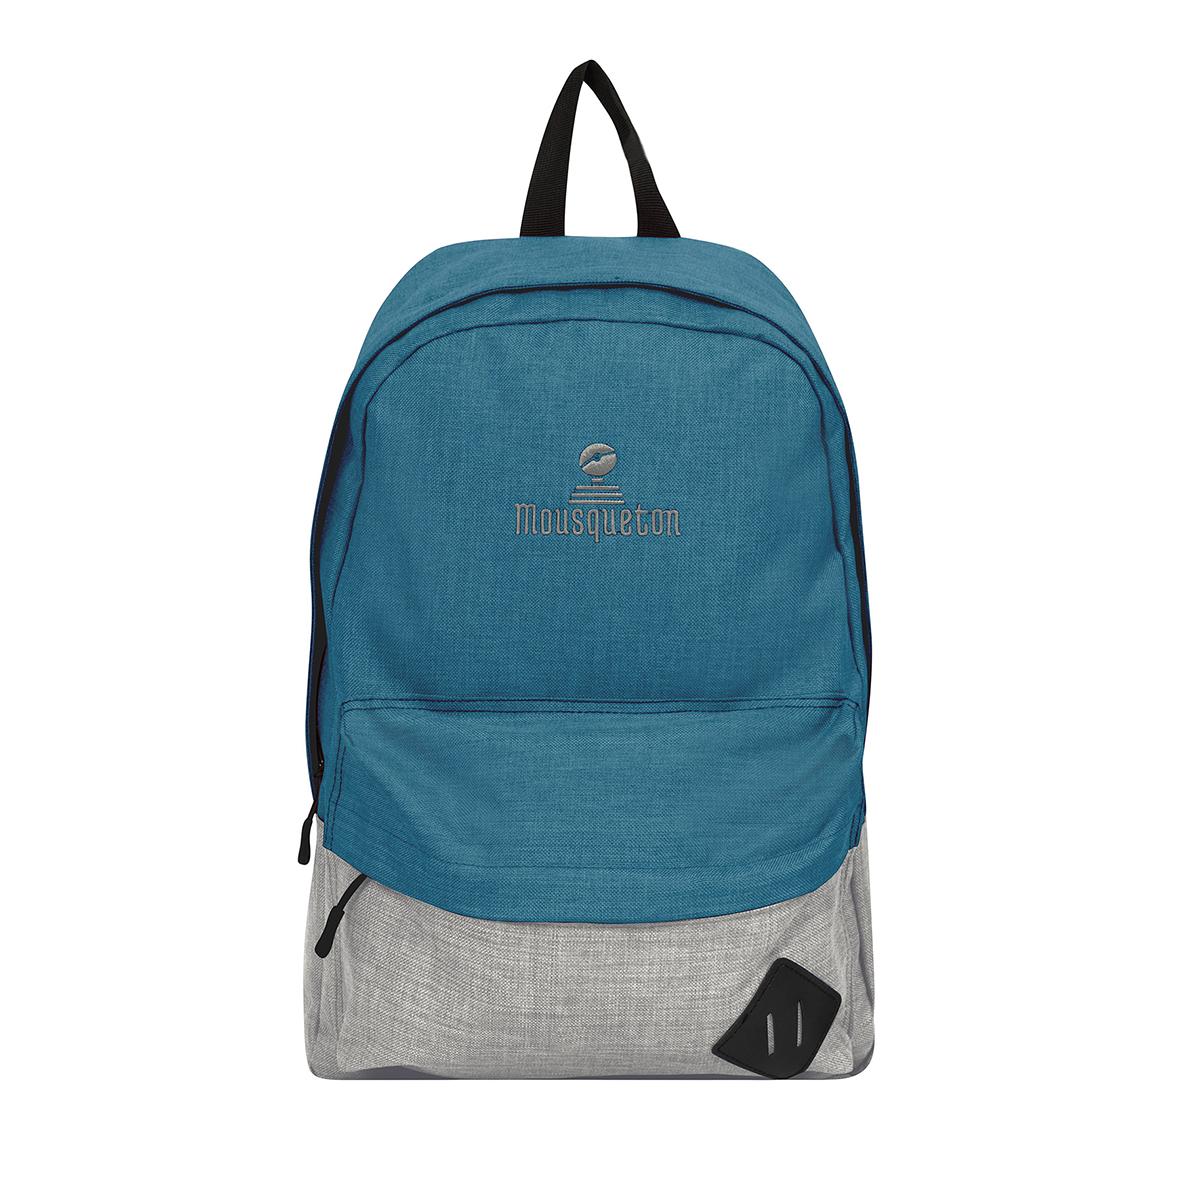 Mousqueton Backpack